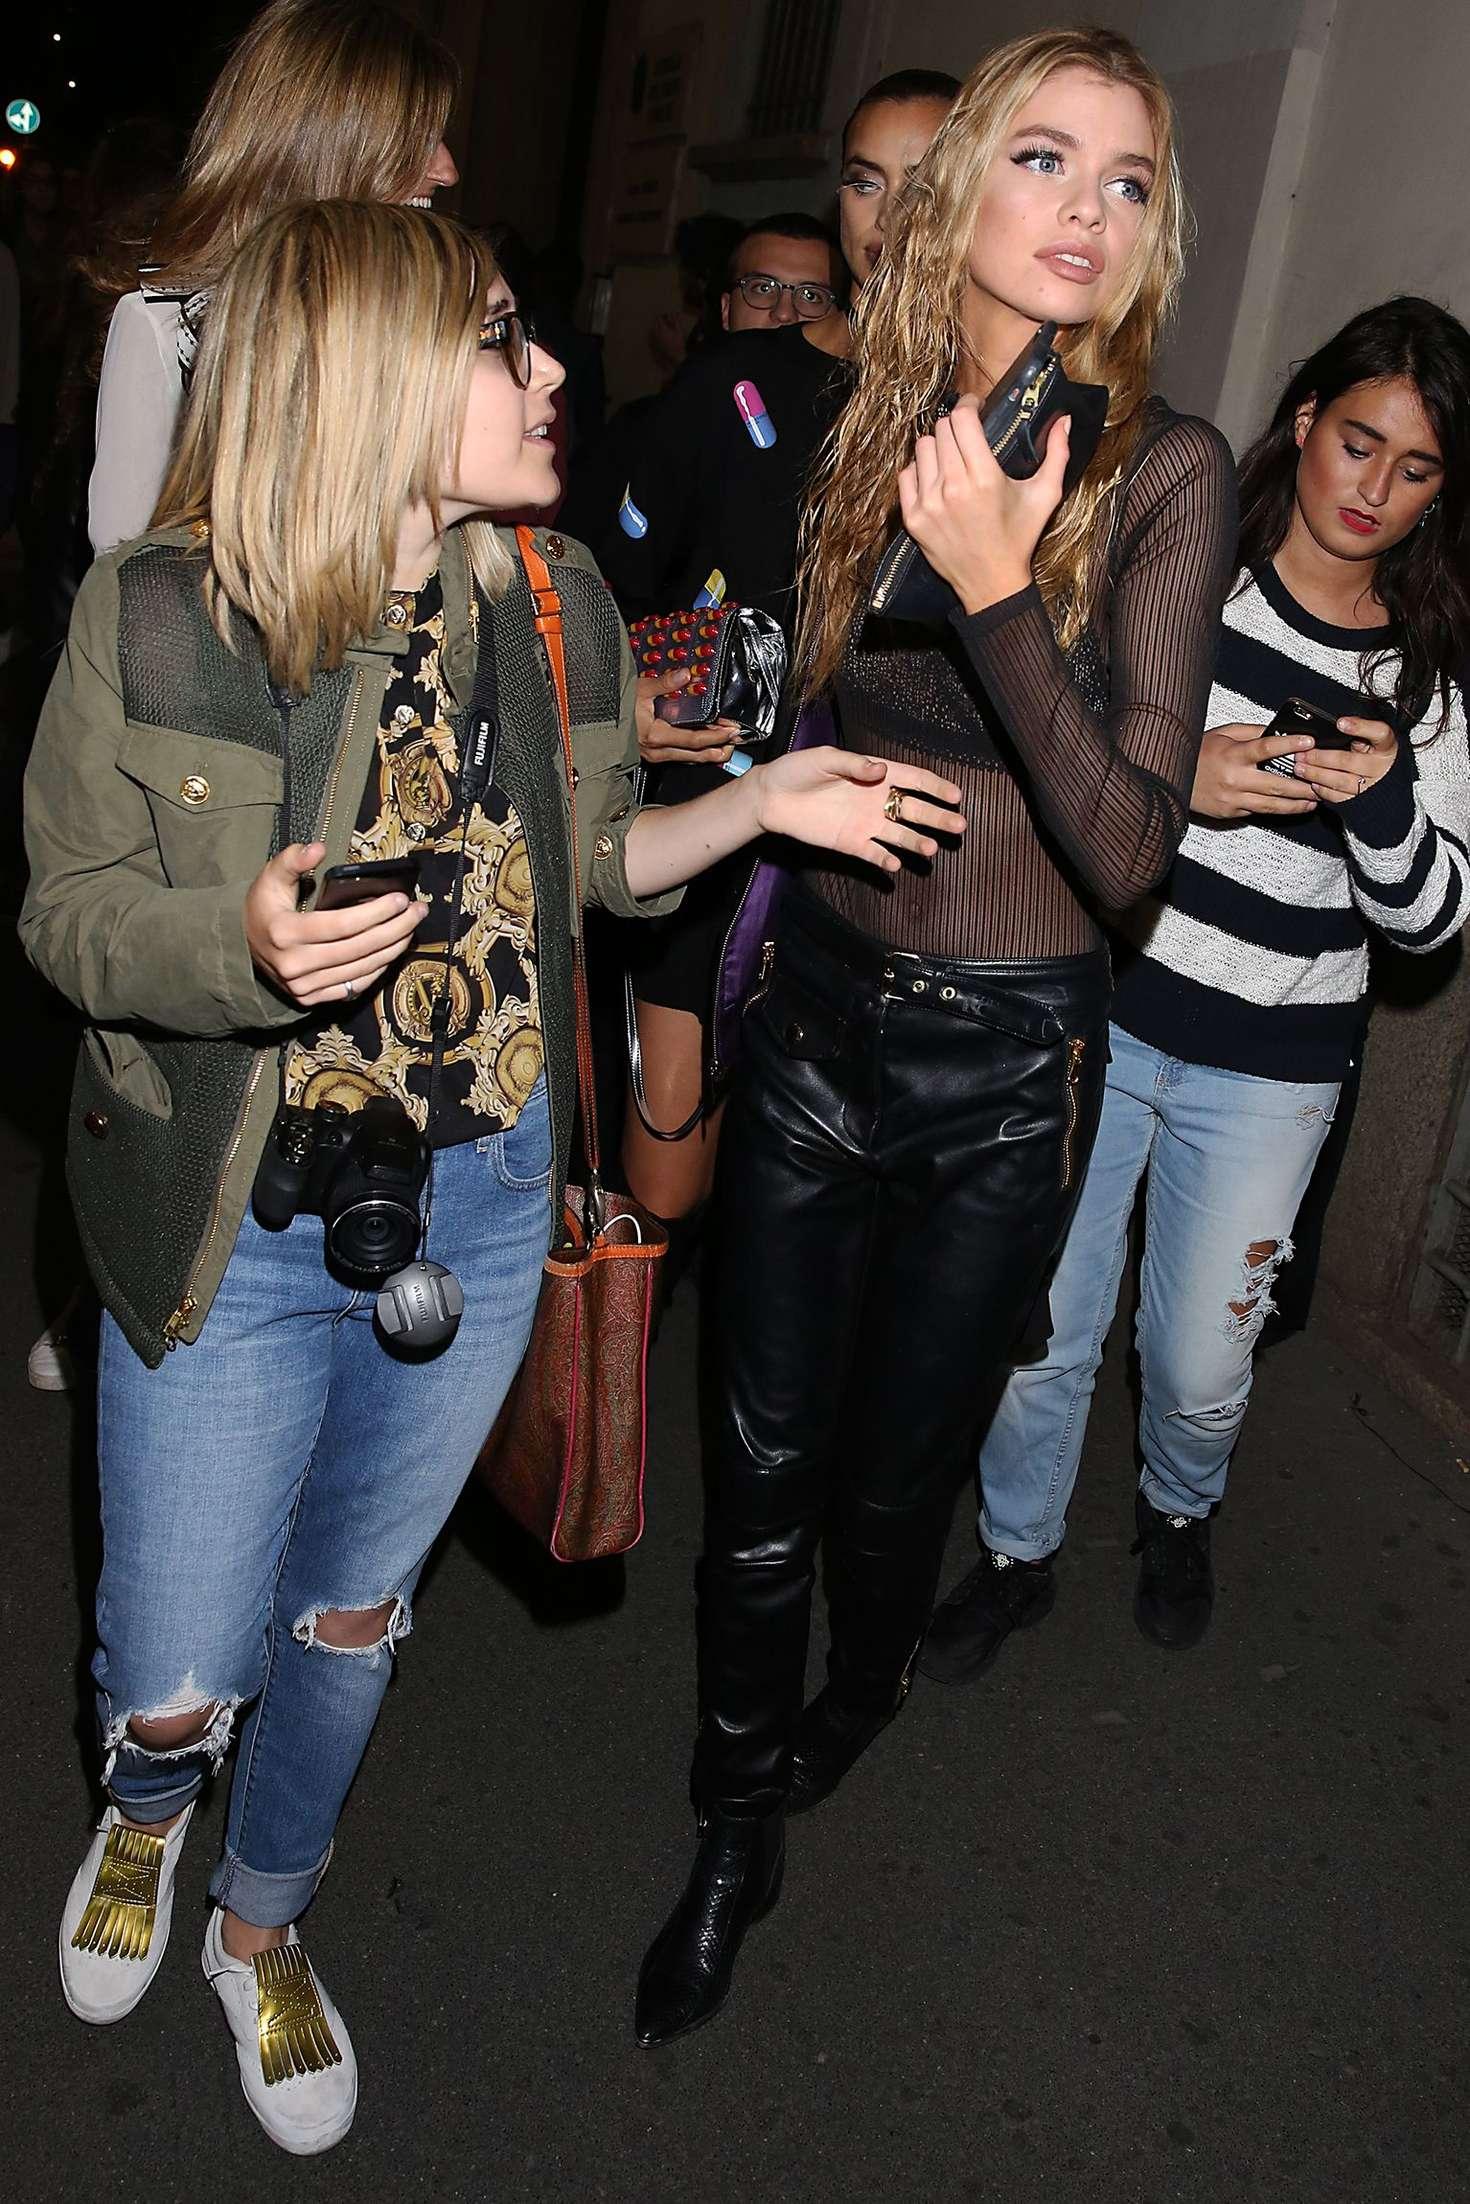 Irina Shayk 2016 : Irina Shayk and Stella Maxwell Leaving Moschino Show 2017 at Milan Fashion Week -13